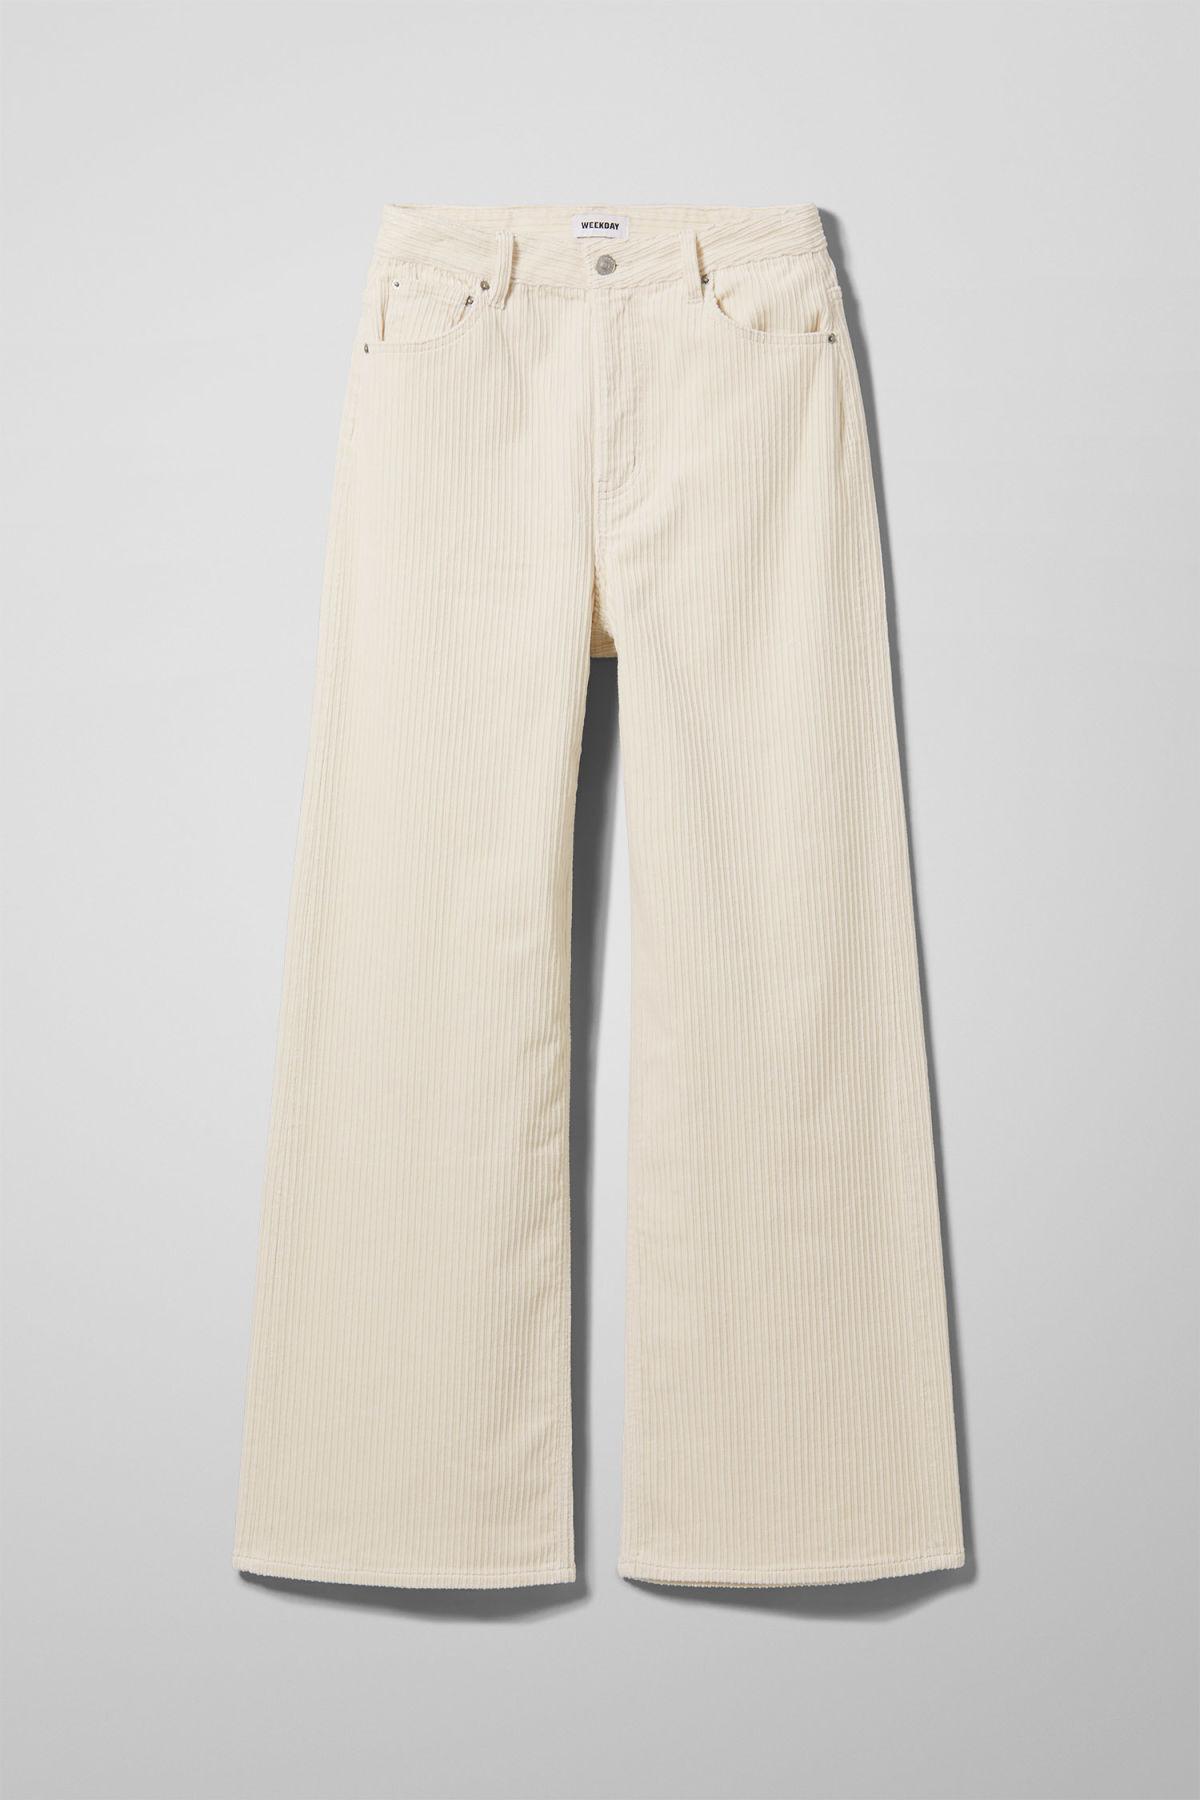 Ace Corduroy Trousers - Beige